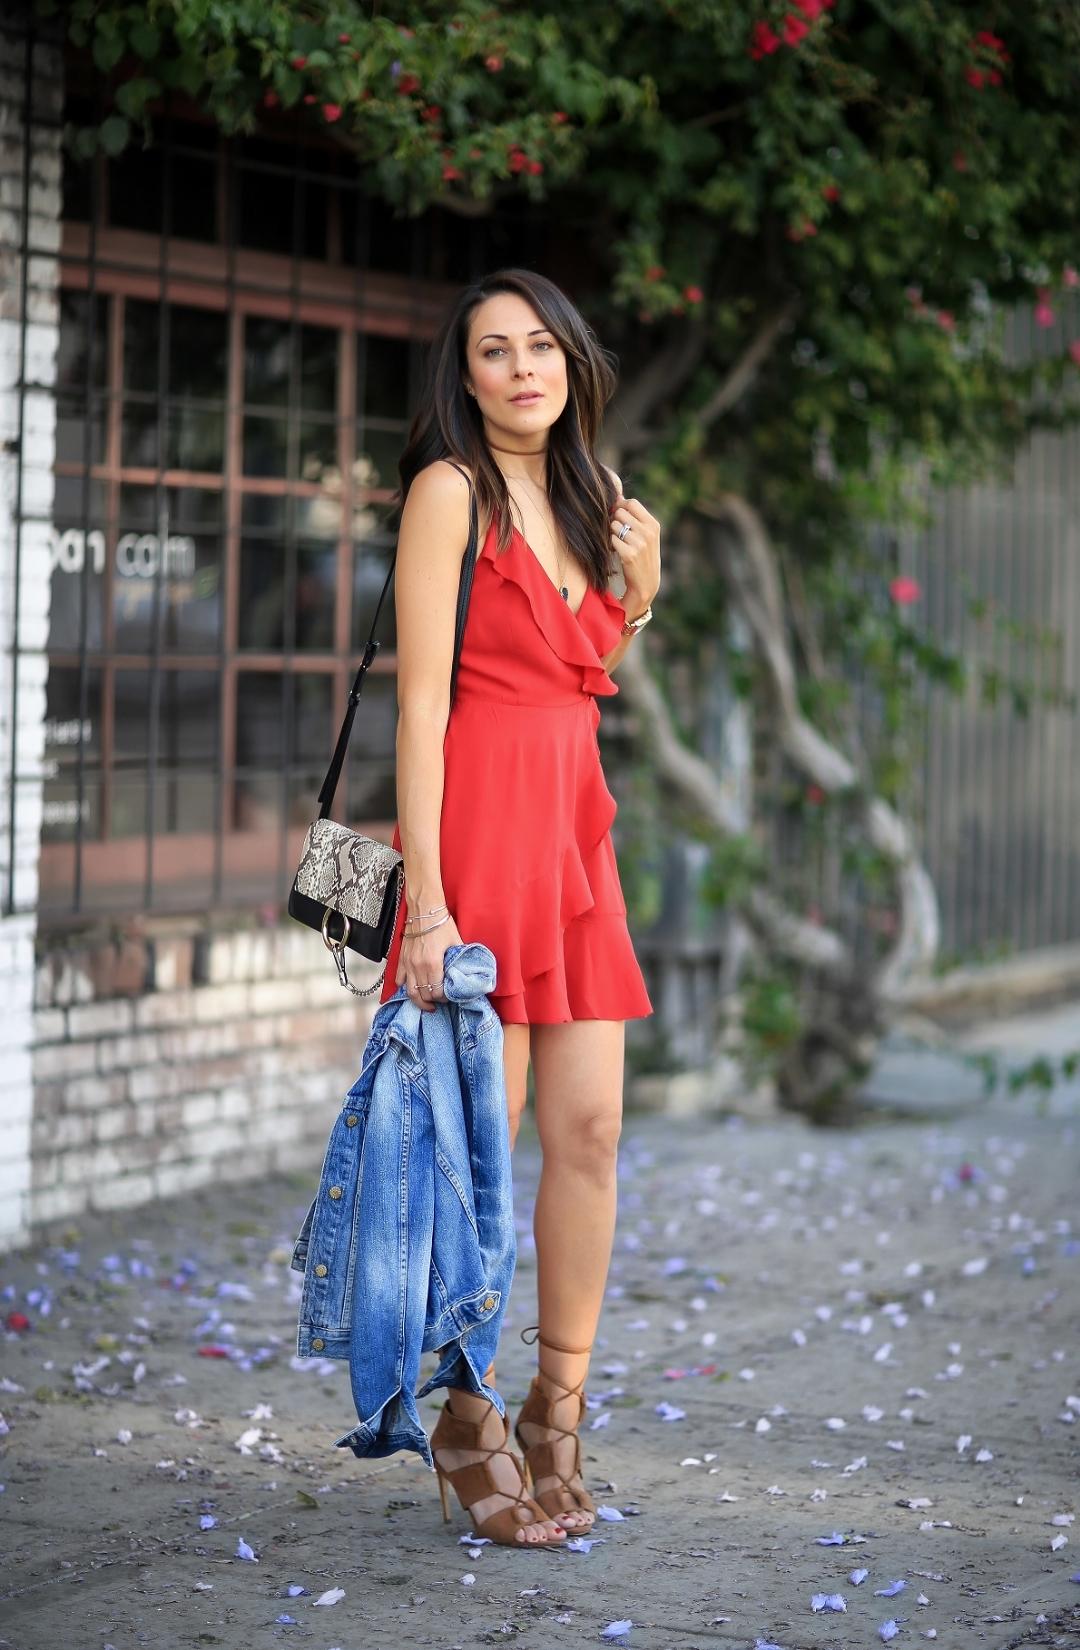 Fashionblogger_LucysWhim_Urban Outfitter_Dress_Zara_Chloe.jpg